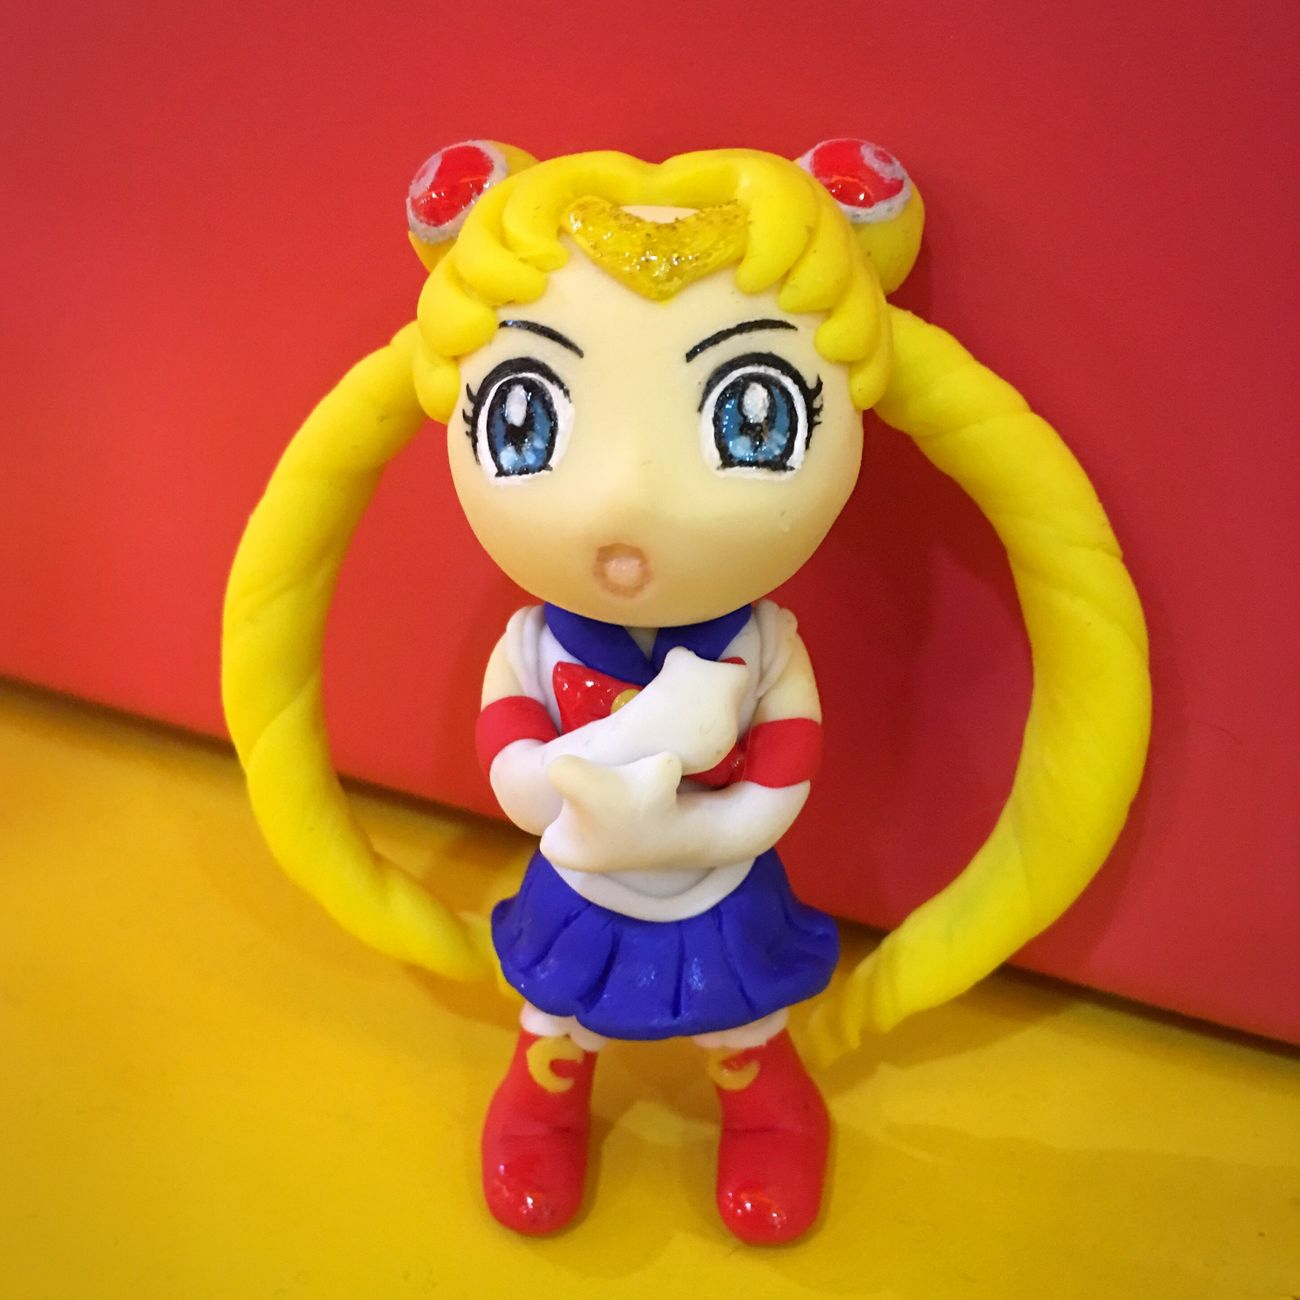 童年回忆-美少女战士水冰月 Sailormoon Sailor Moon Polymer Clay DIY Handmade Girl Cartoon